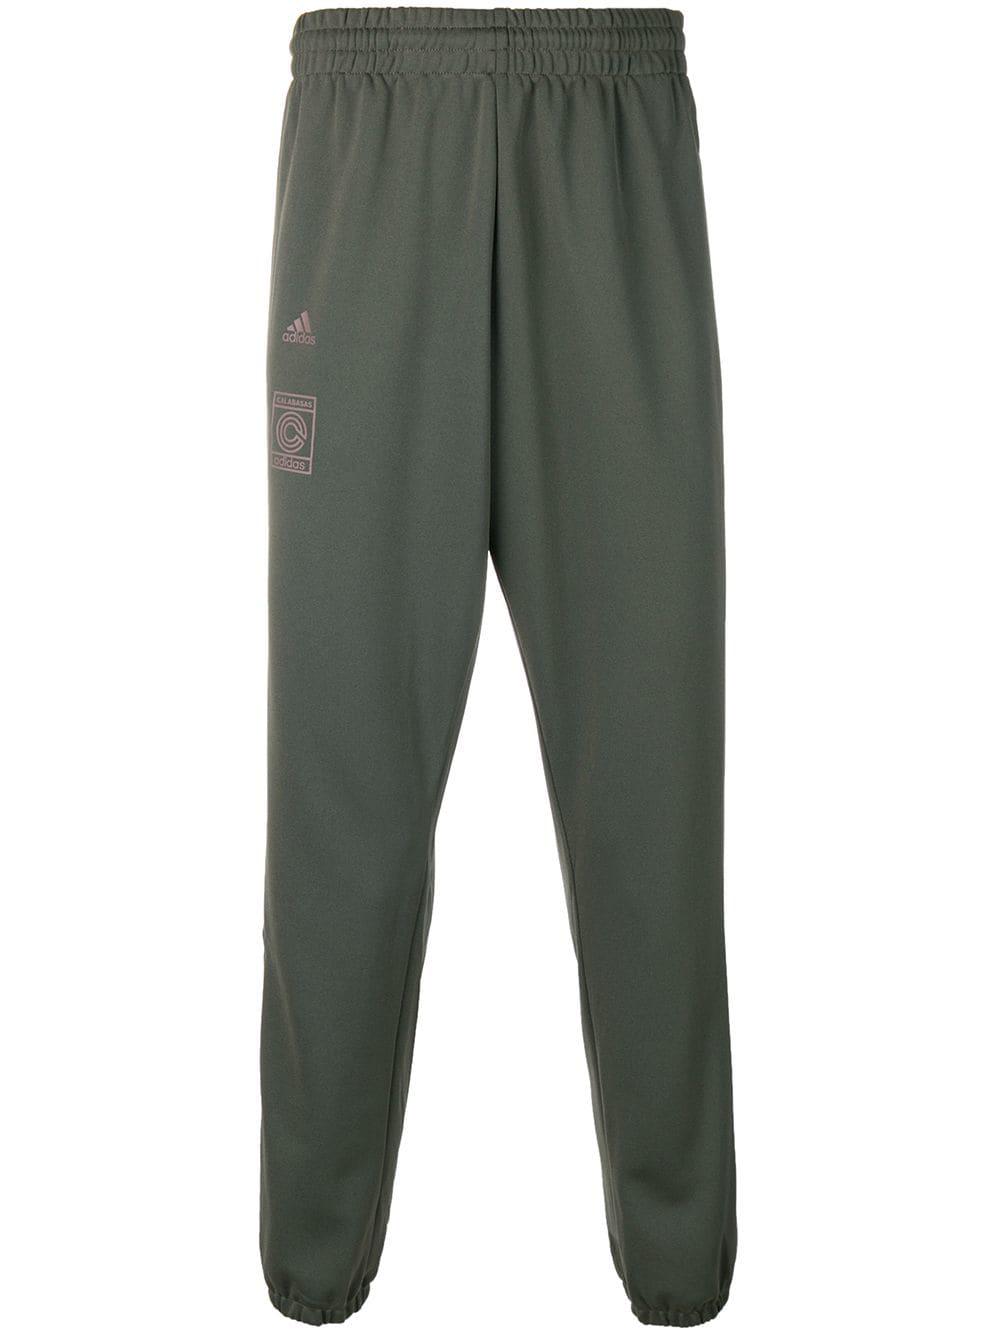 45a258a19 Yeezy Calabasas Track Pants - Green